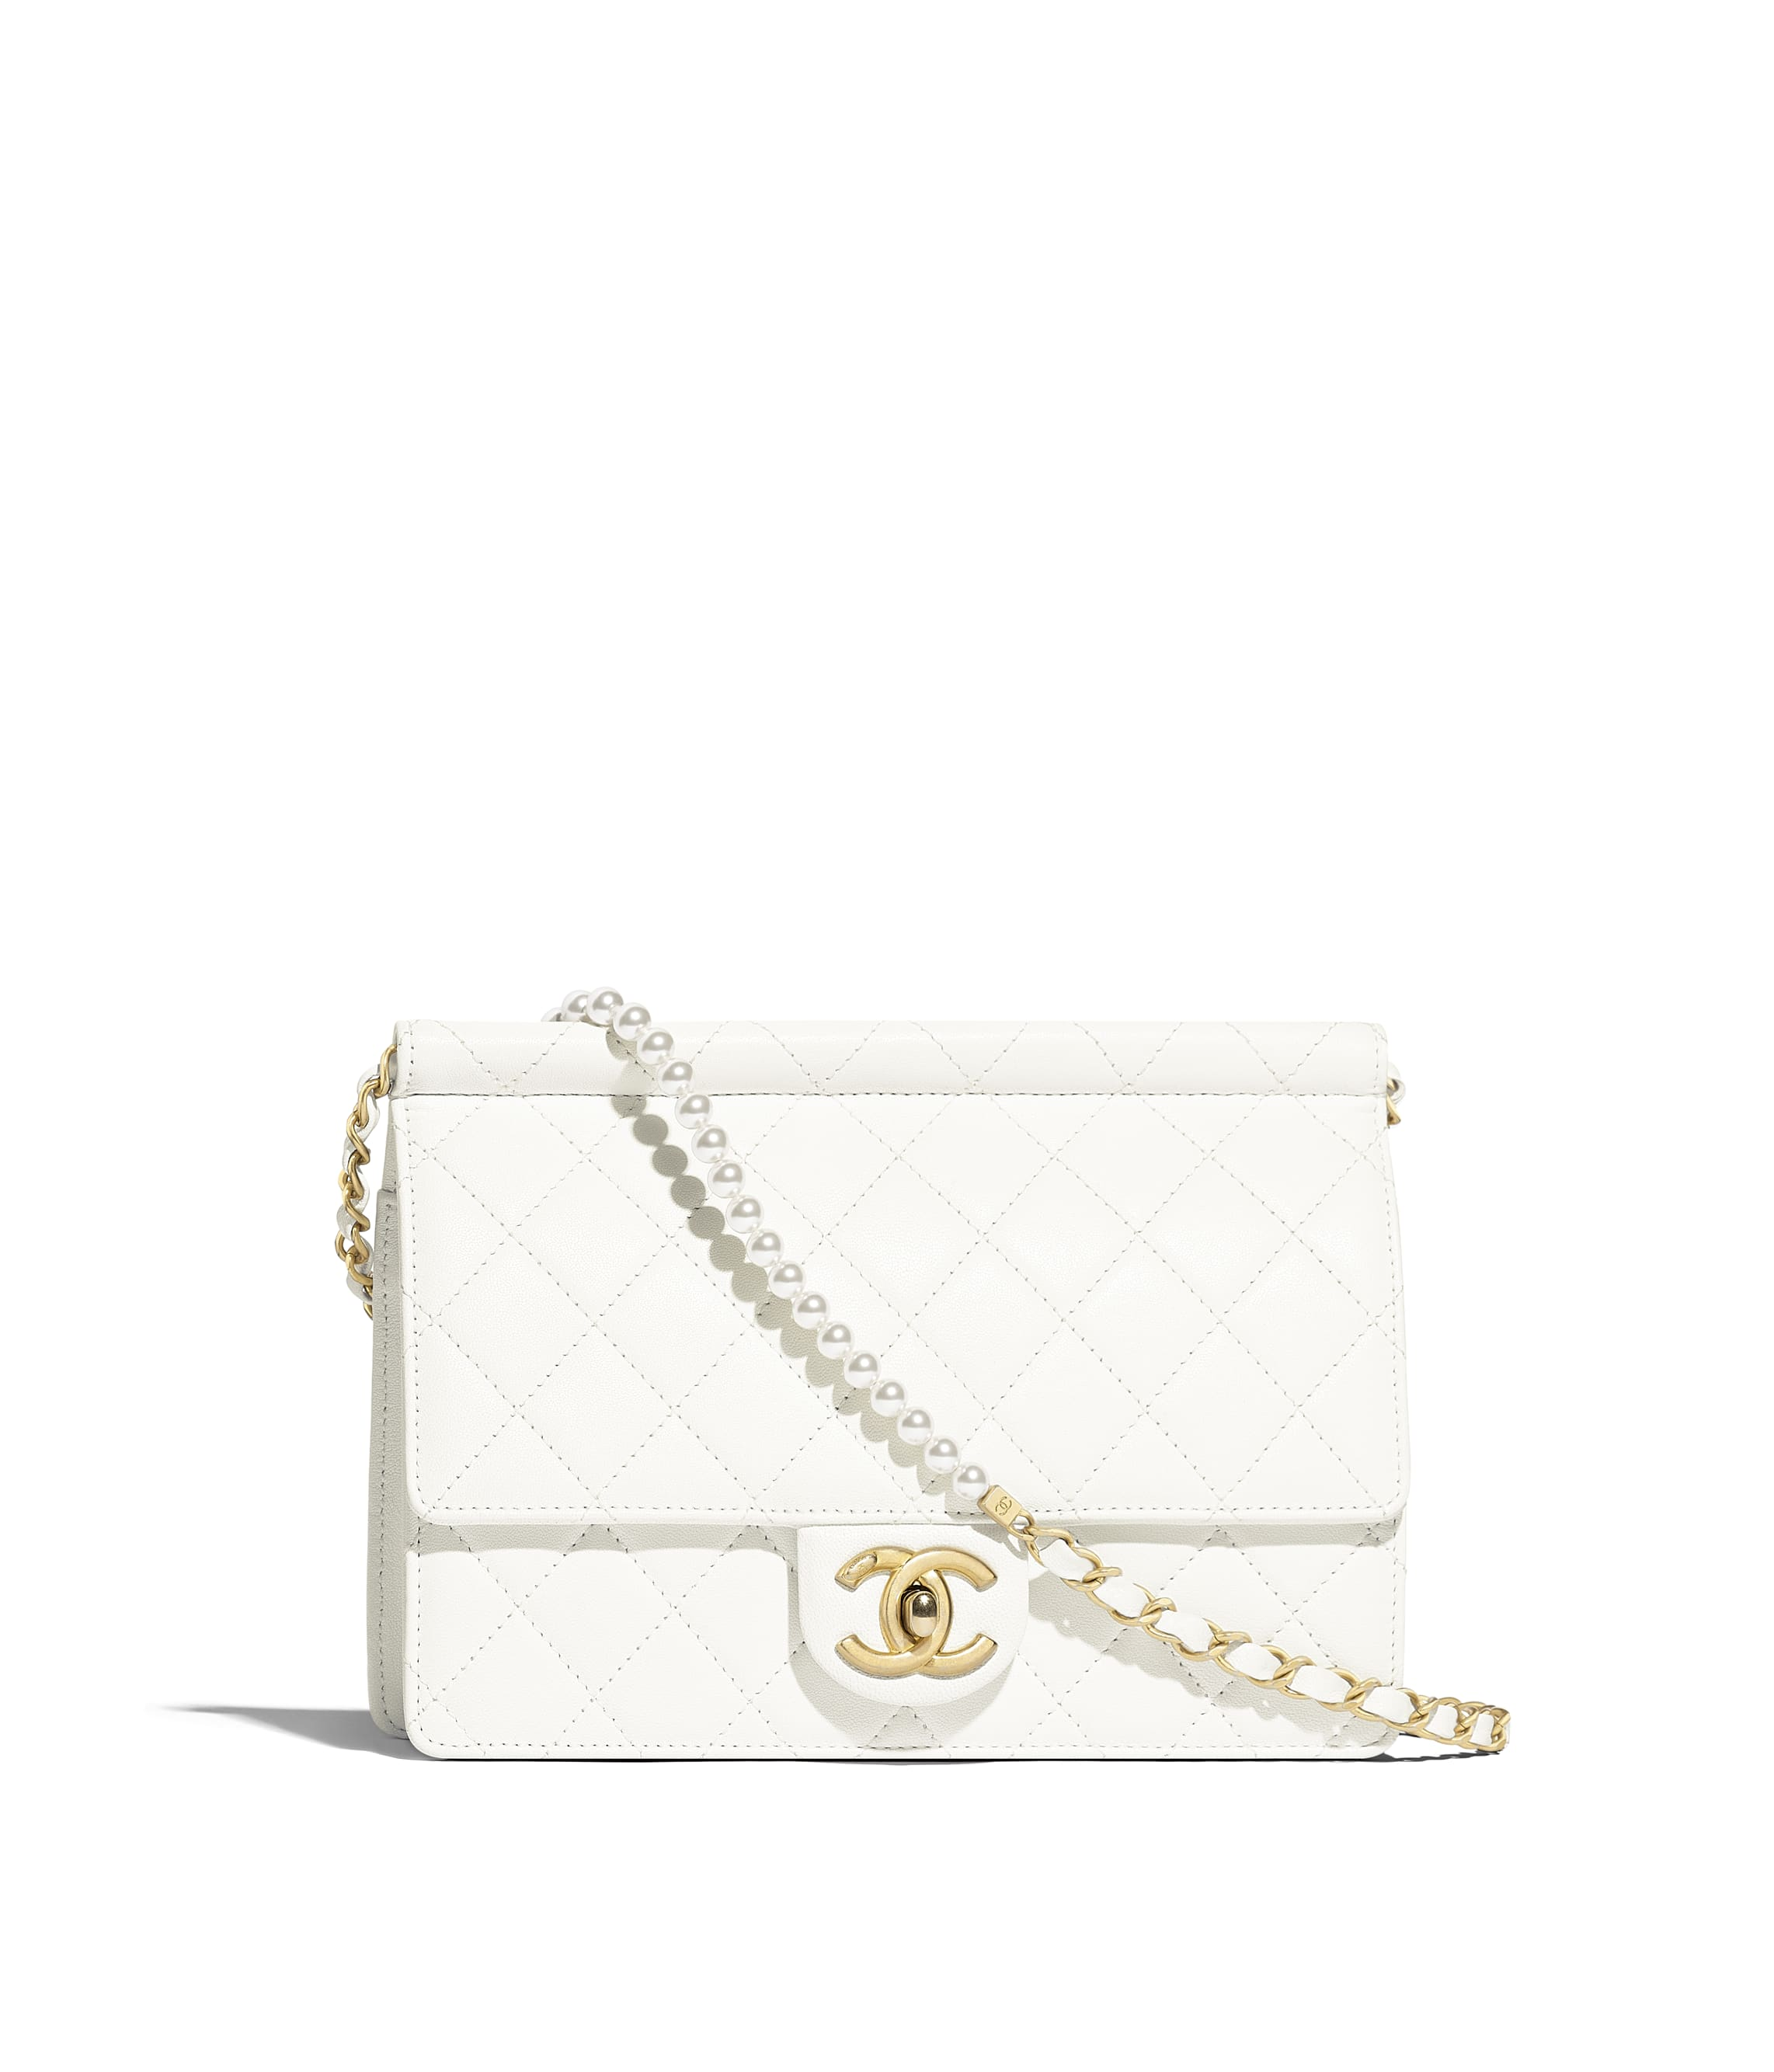 e1debaccfc0b Flap Bags - Handbags - CHANEL